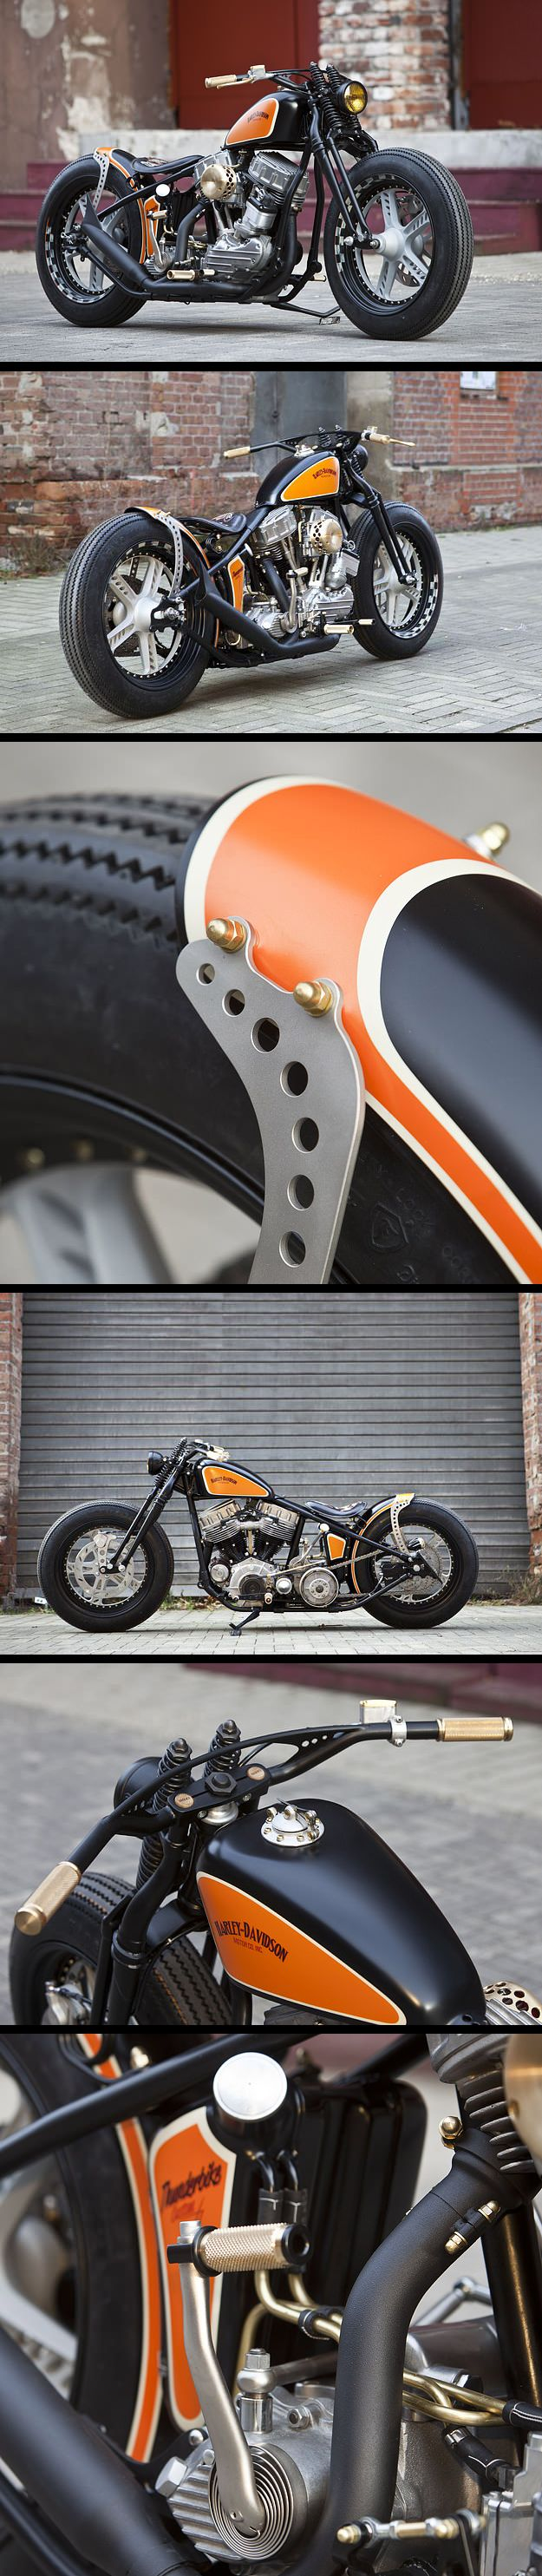 Harley Davidson 1951 Bobber par Thunderbike #motorcycles #motos #bobber | caferacerpasion.com